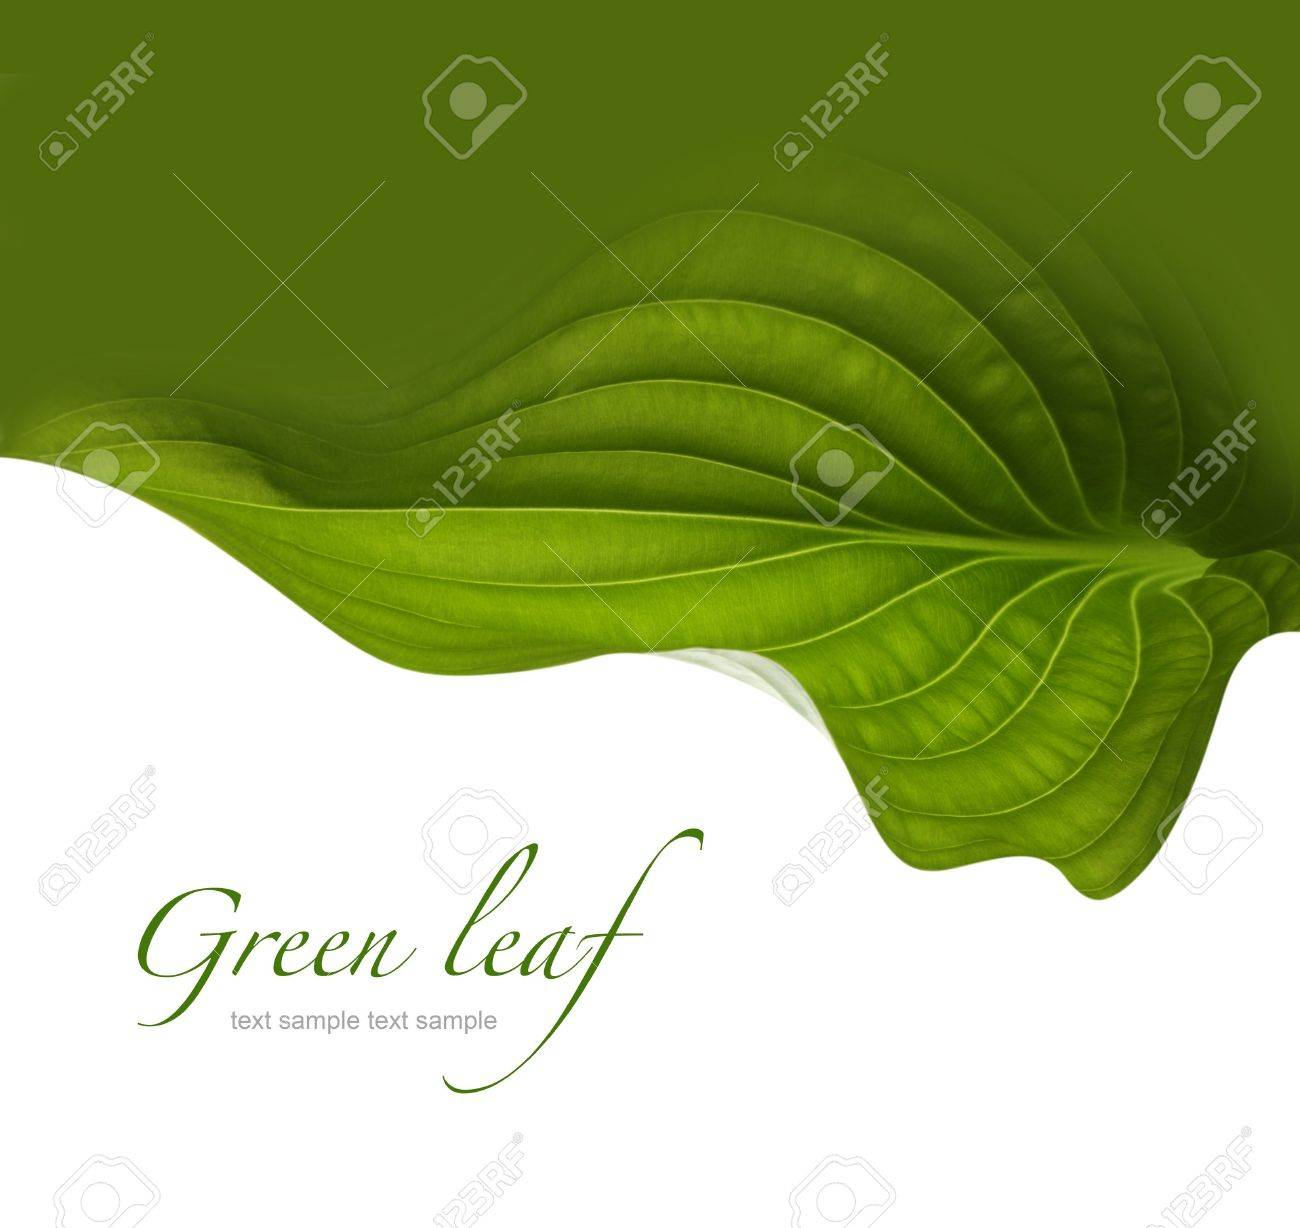 green leaf background Stock Photo - 20145273